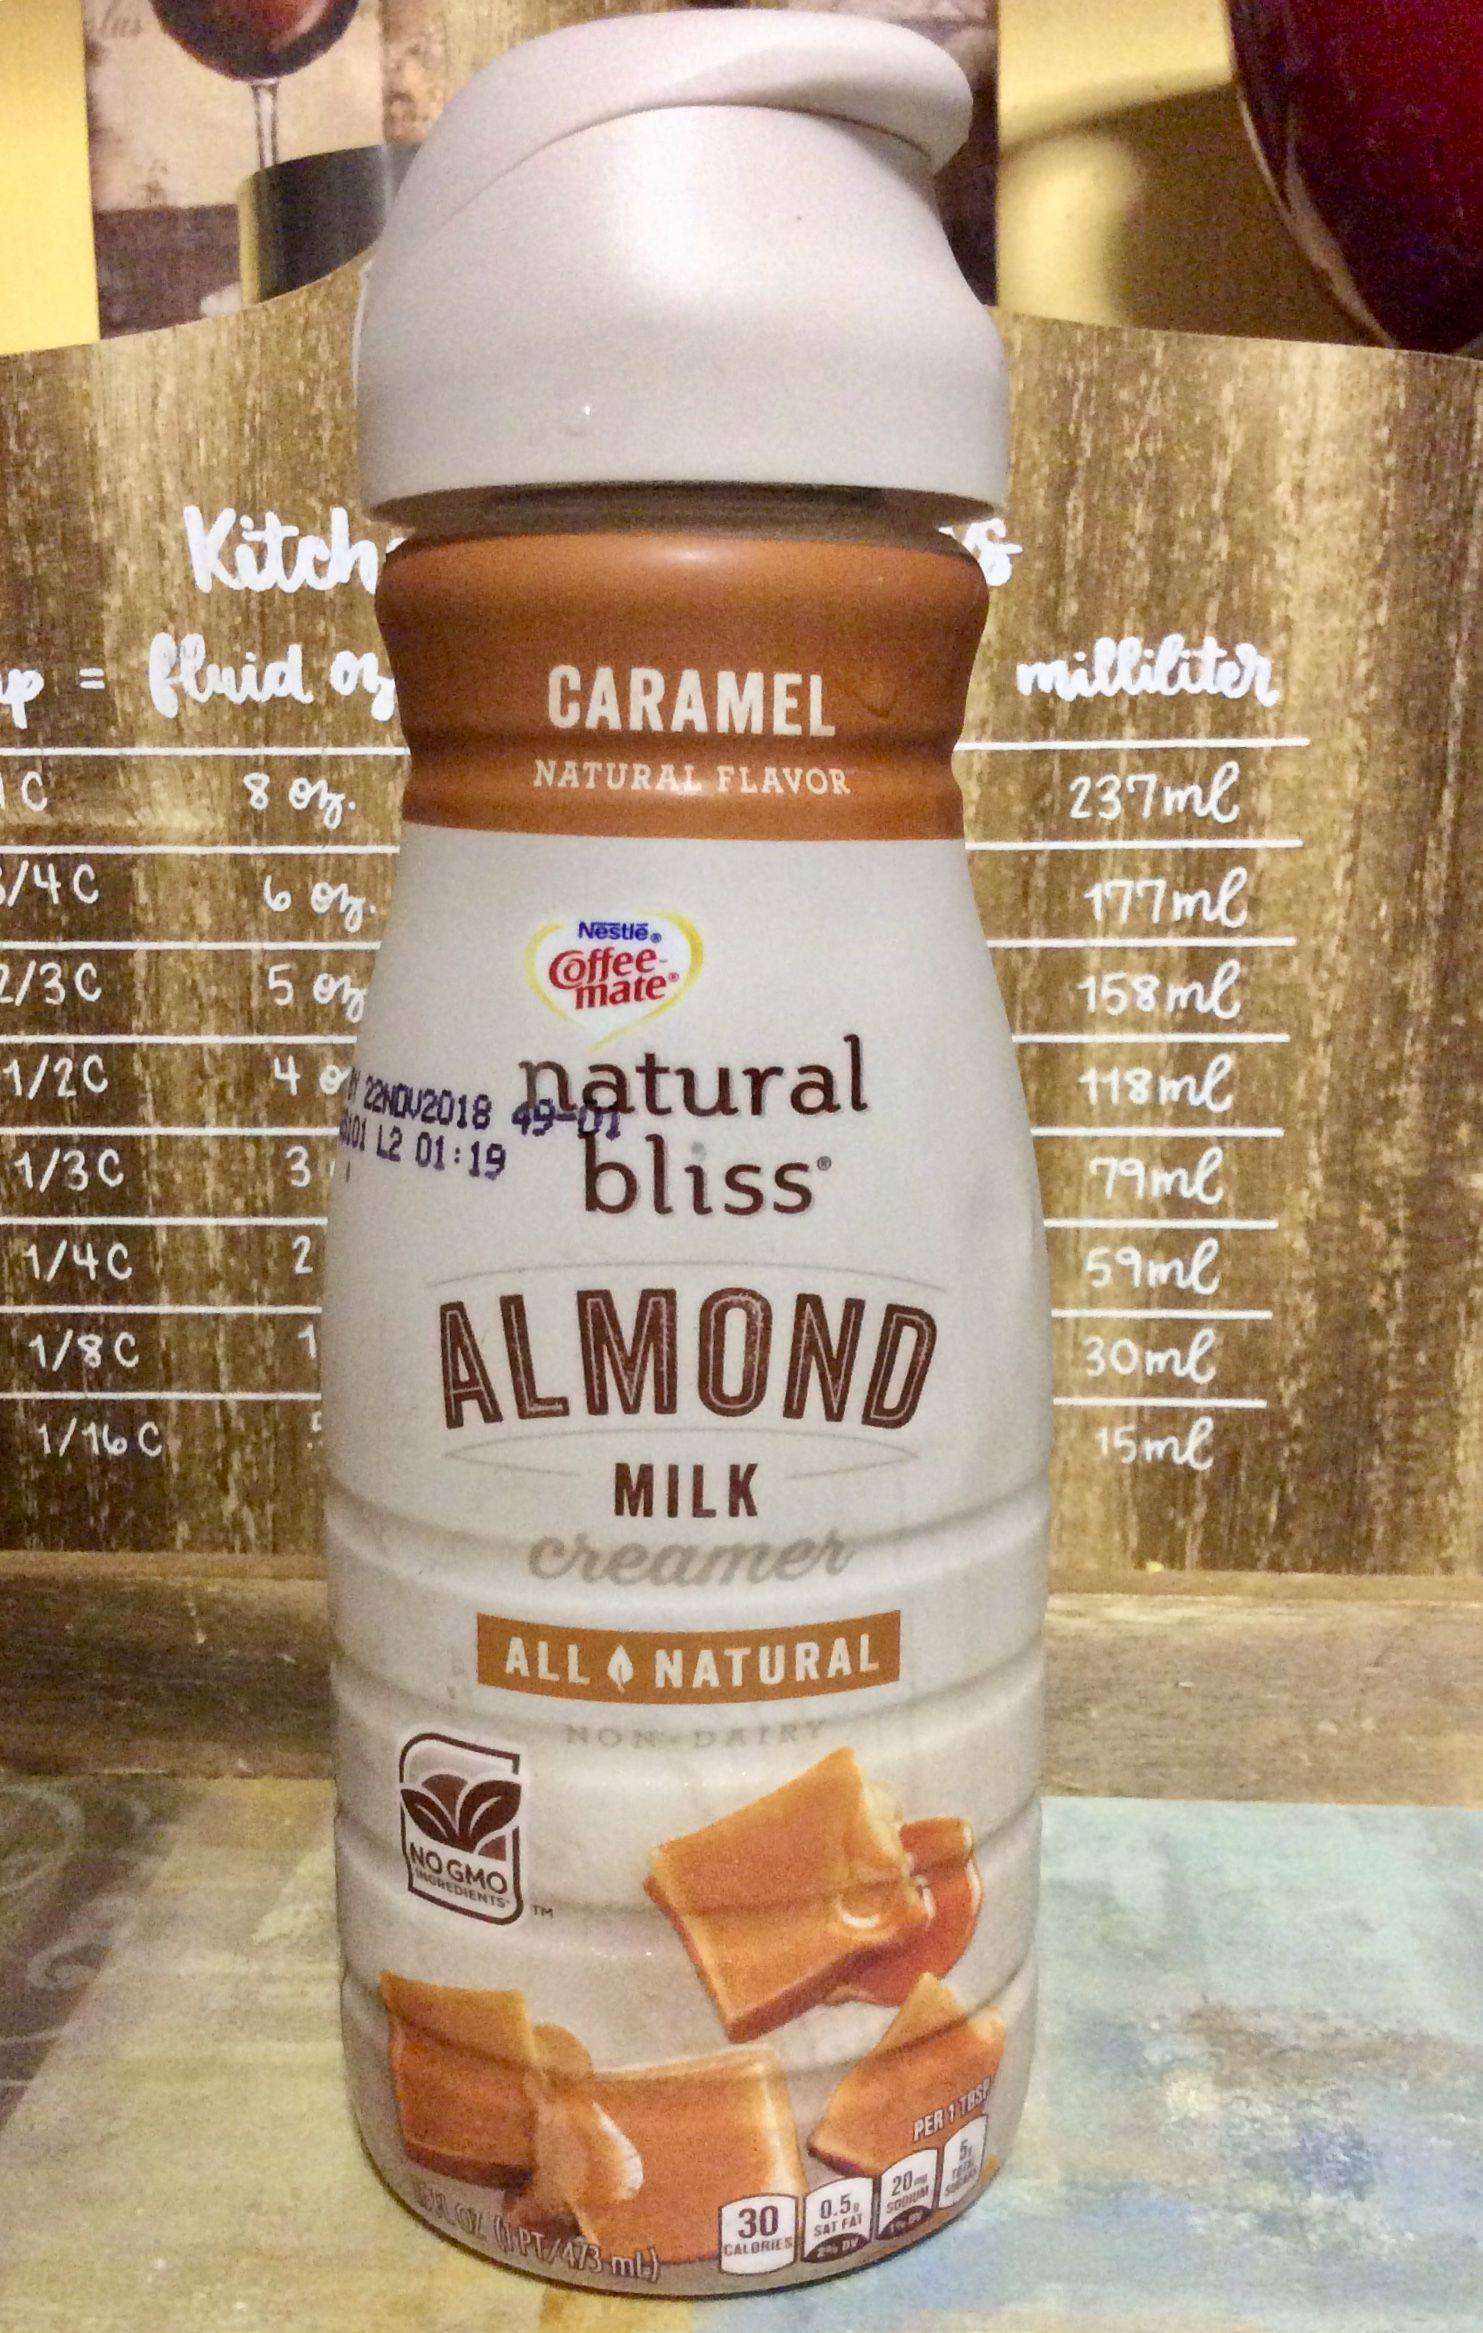 CoffeeMate Natural Bliss Caramel Almond Milk Creamer